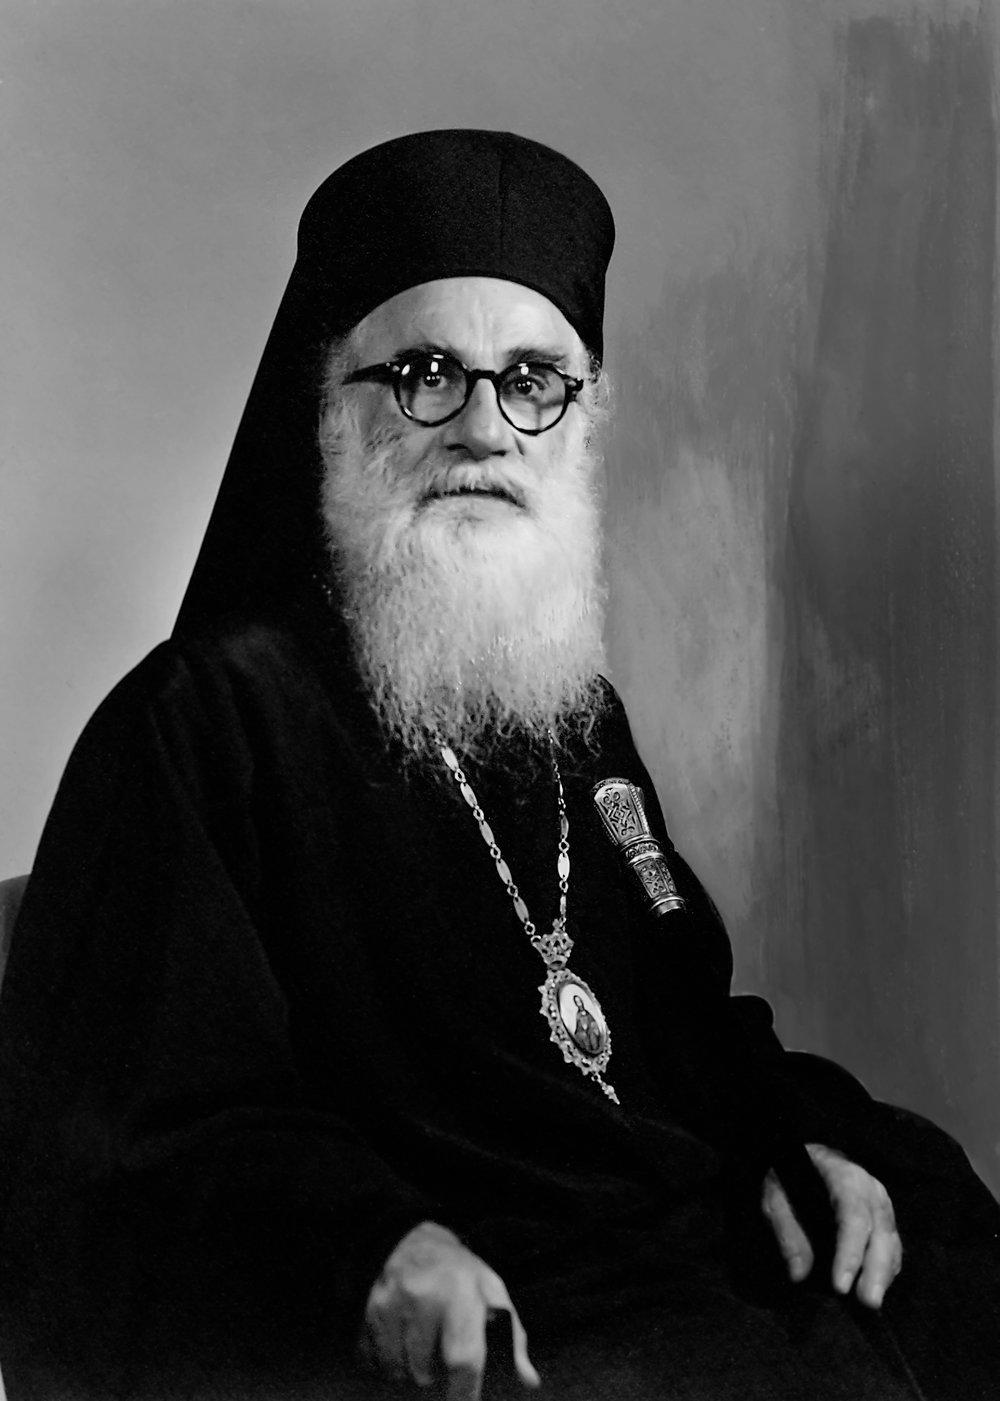 His Eminence Archbishop Michael